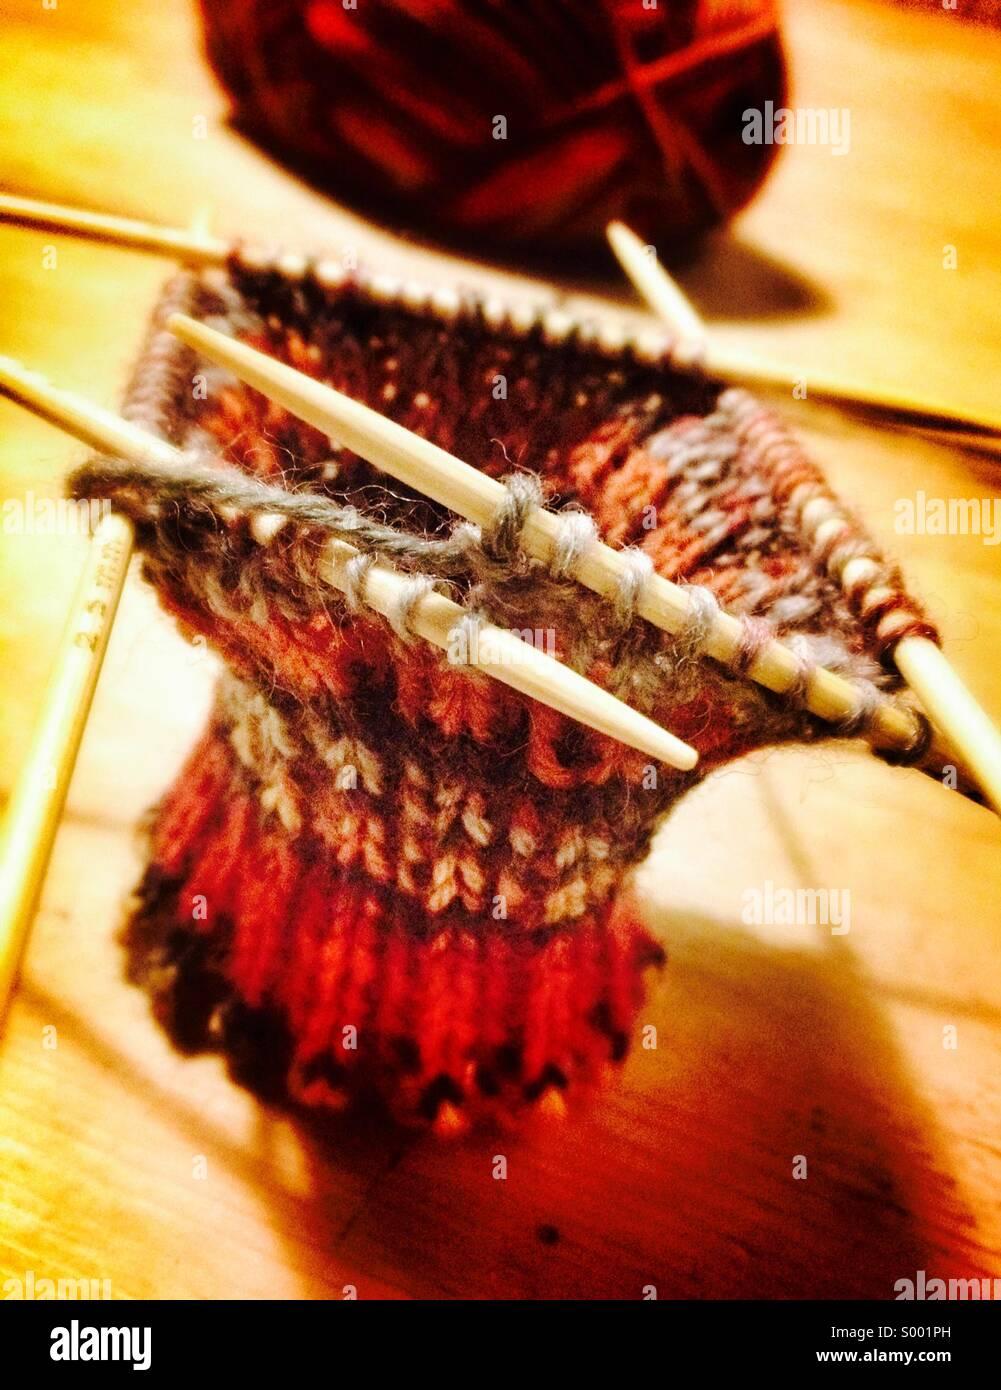 Knitting socks, close up of knitting needles and wool - Stock Image